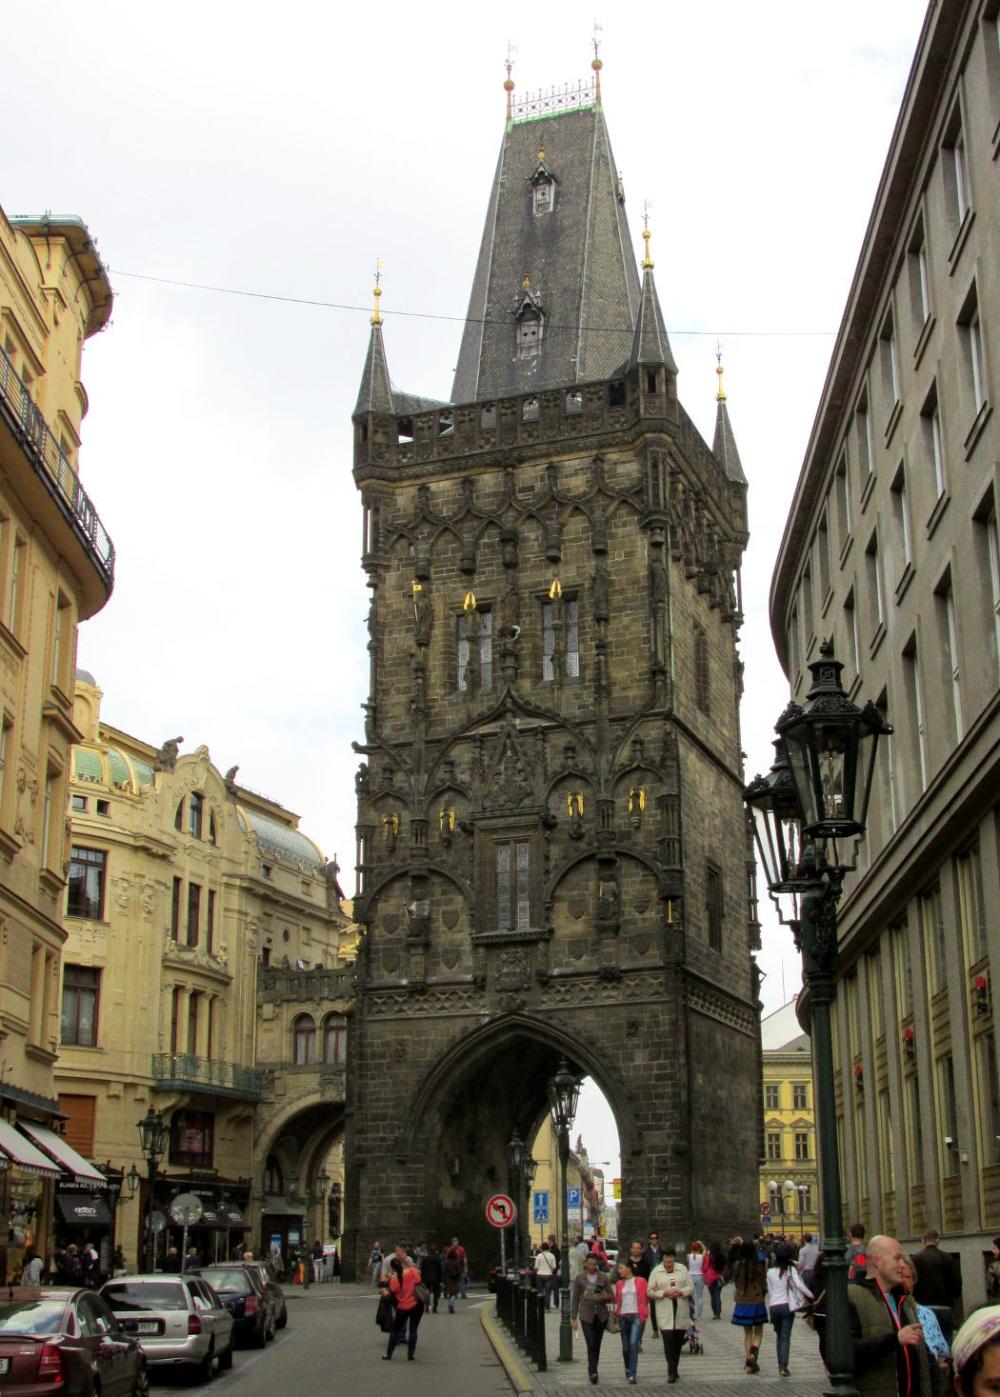 Volaré Viajando Qué Ver En Praga En Dos Días 10 Visitas Imprescindibles Que Ver En Praga Praga En Dos Dias Praga